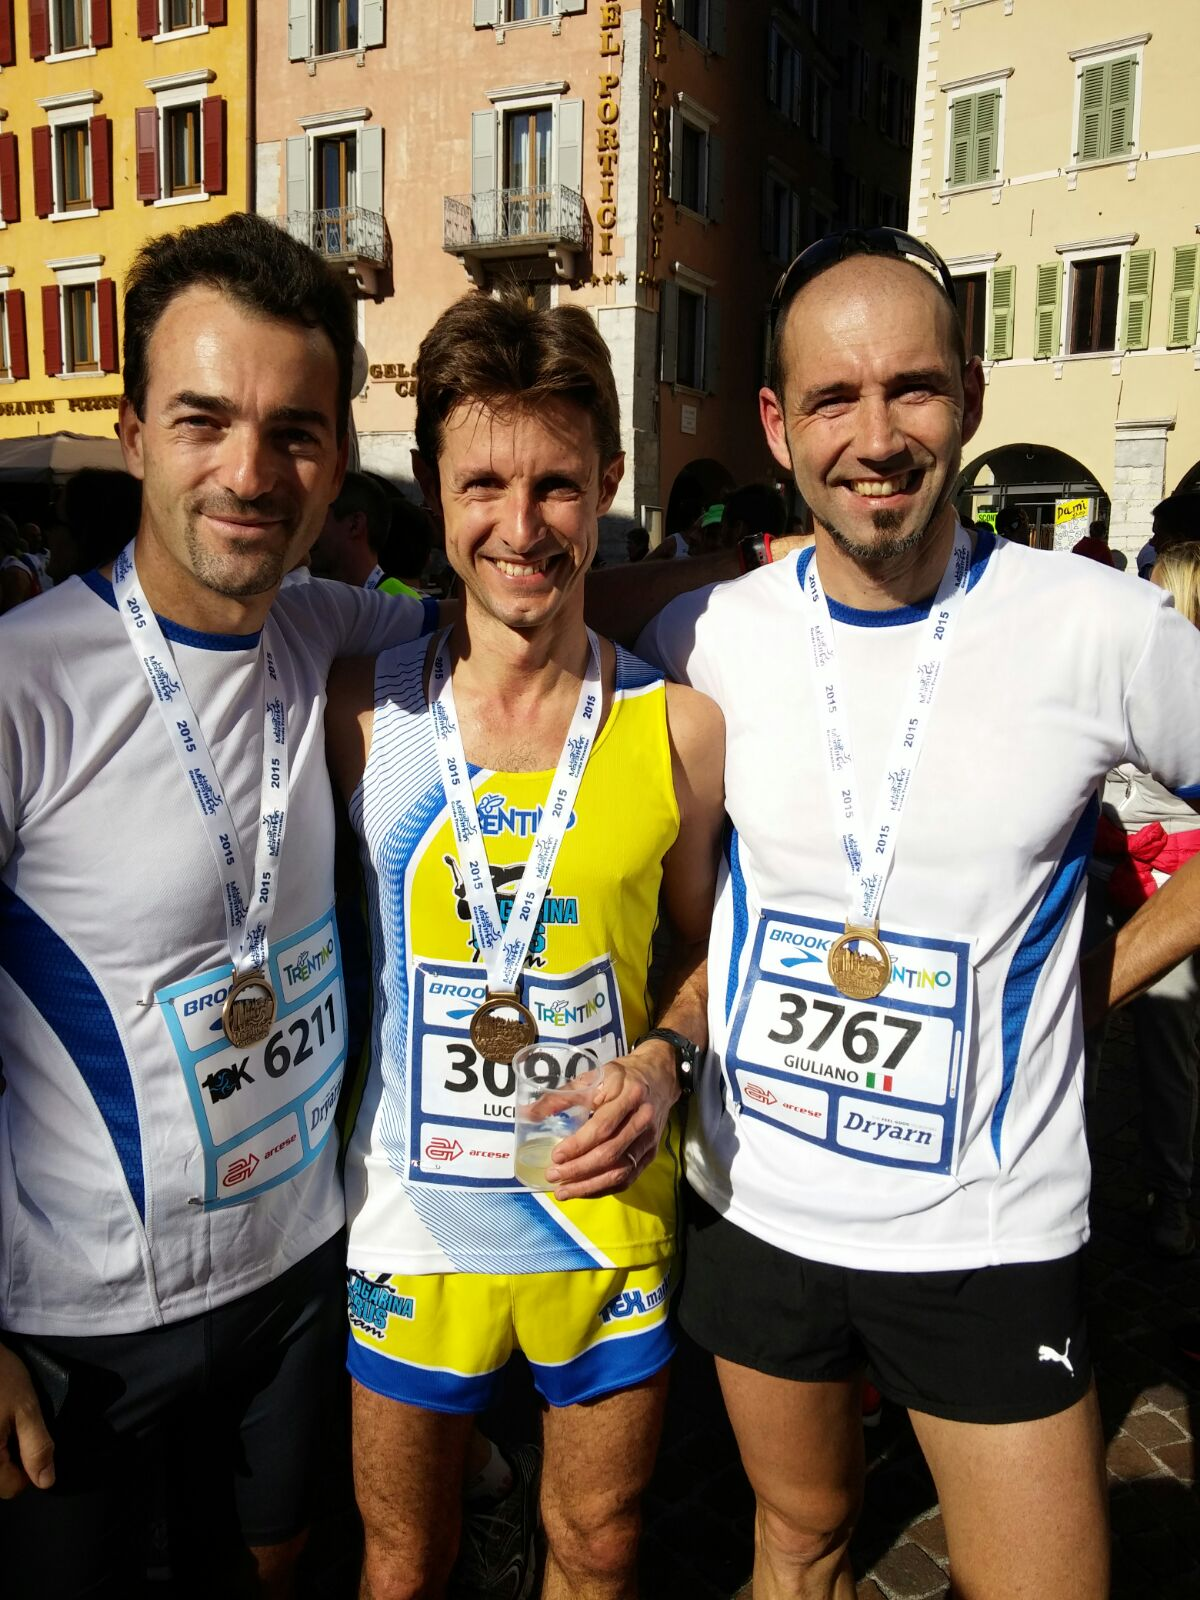 Garda Trentino Half Marathon: Mauro, Lucio ed io